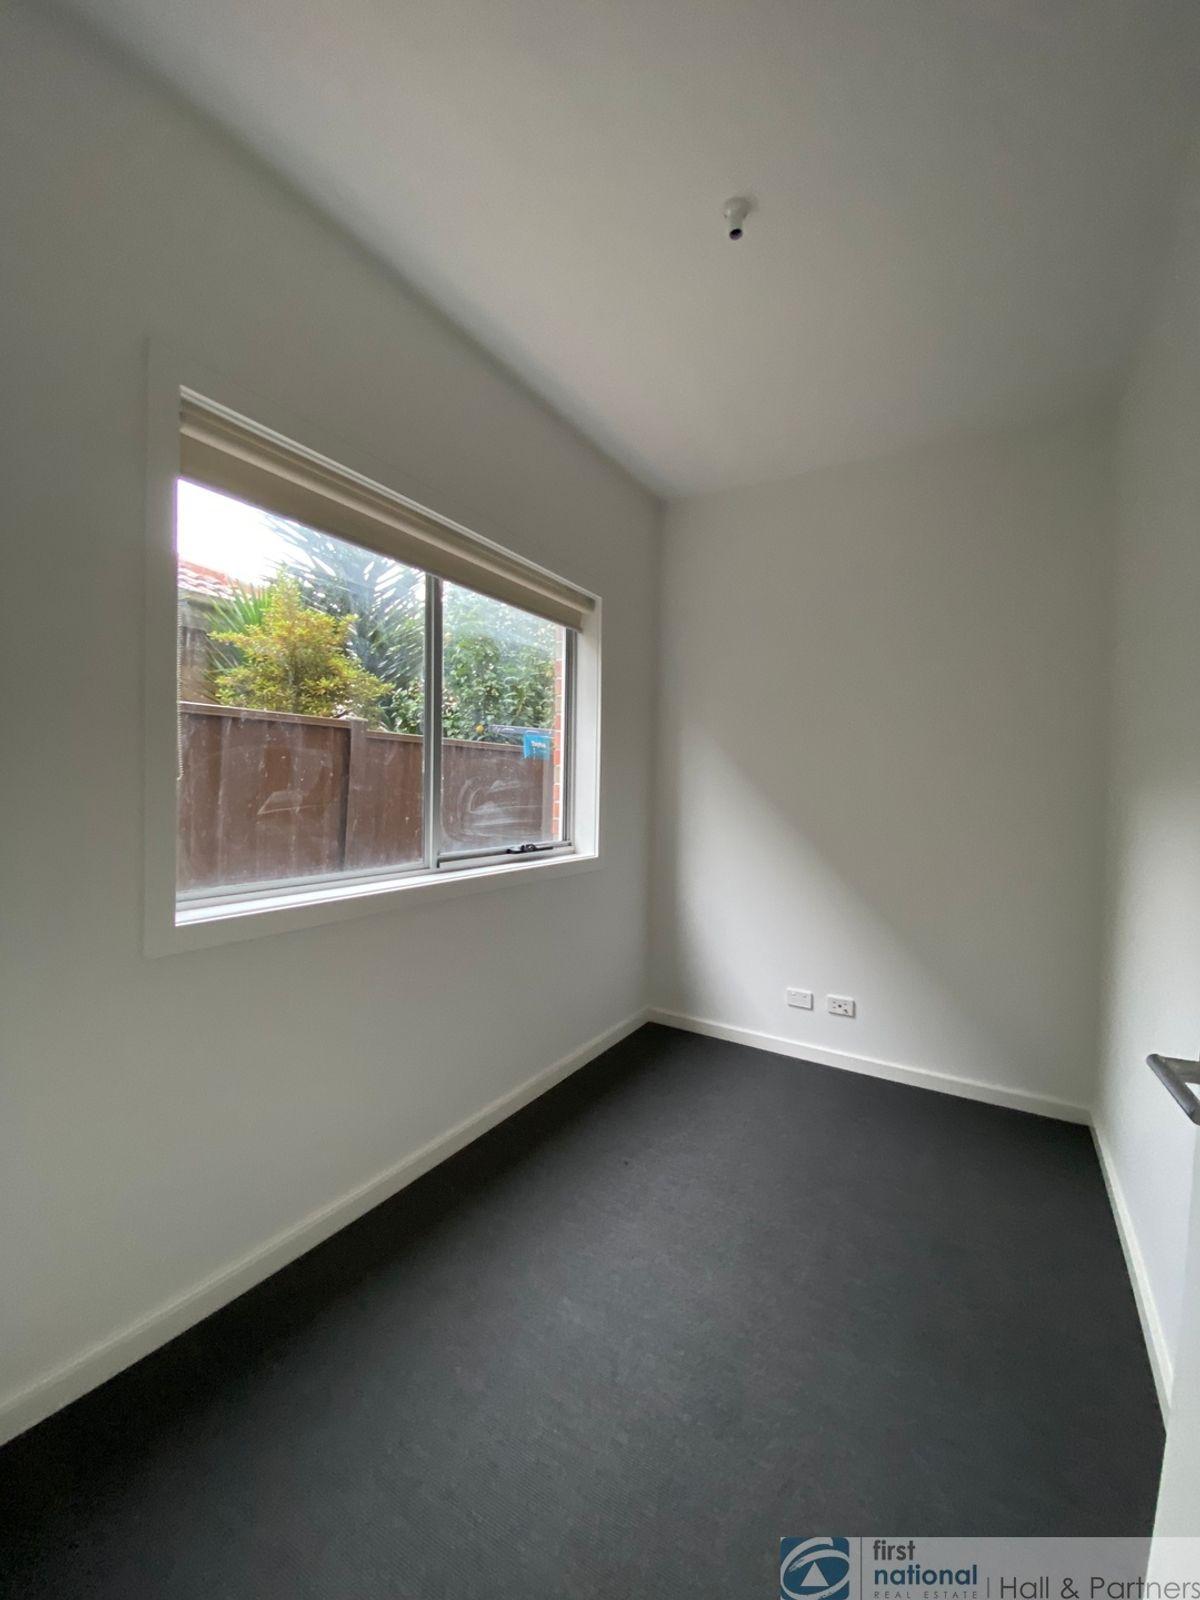 8/6 Little Windrock Lane, Craigieburn, VIC 3064